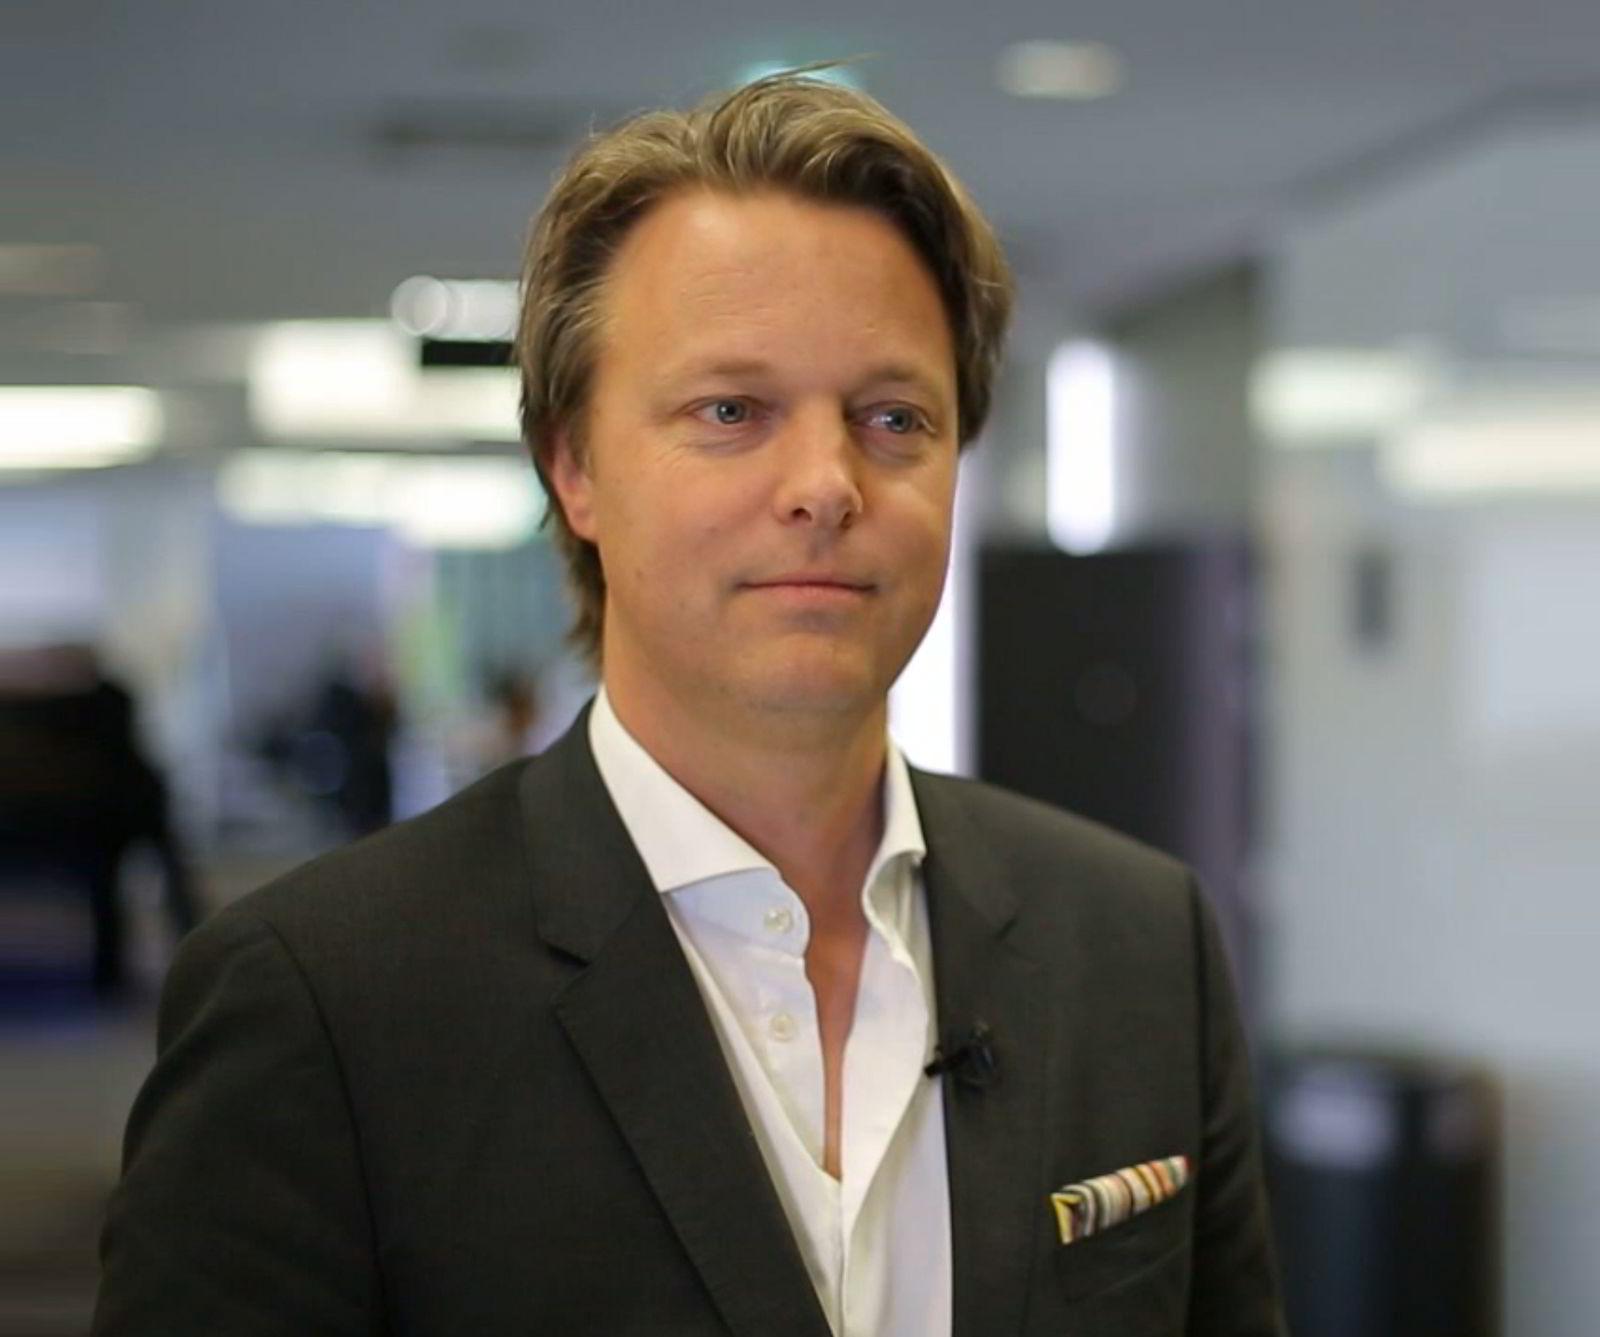 FØLGER UTVIKLINGEN. Direktør Jarle Holmfor «Innovation and Business Development» i Evry. FOTO: Pressebilde